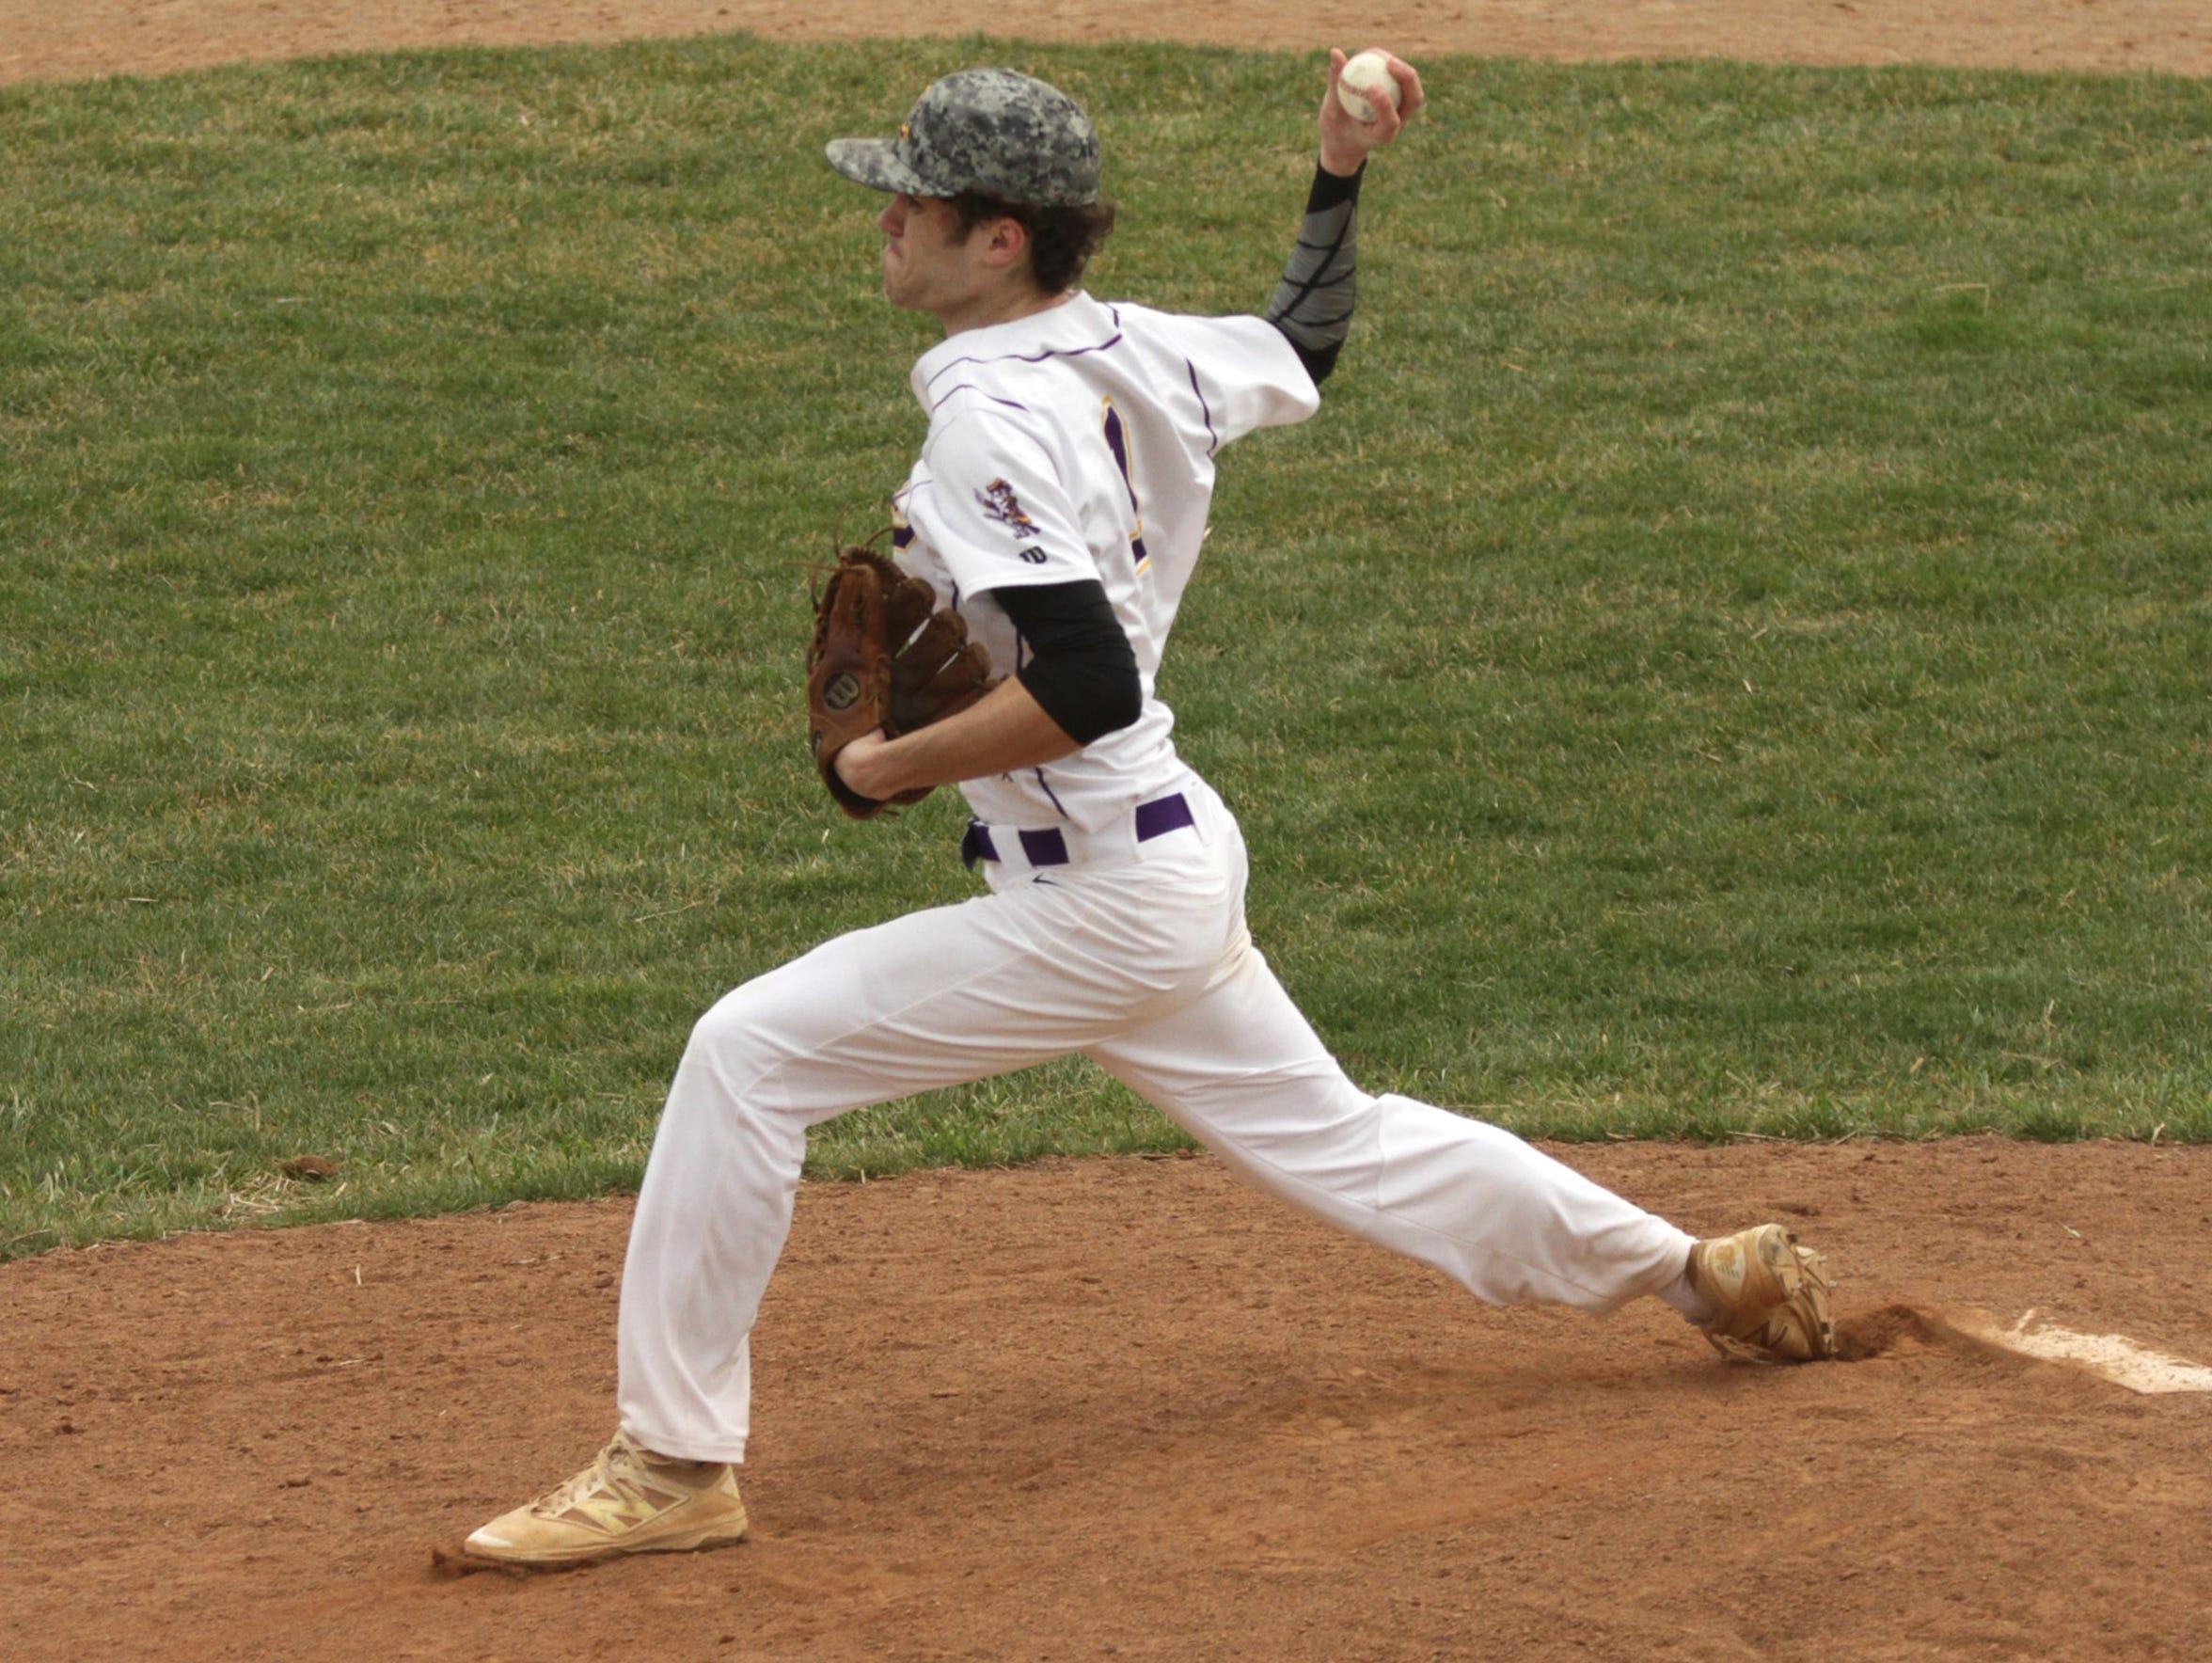 Lexington's Jake Depperschmidt pitches a home game